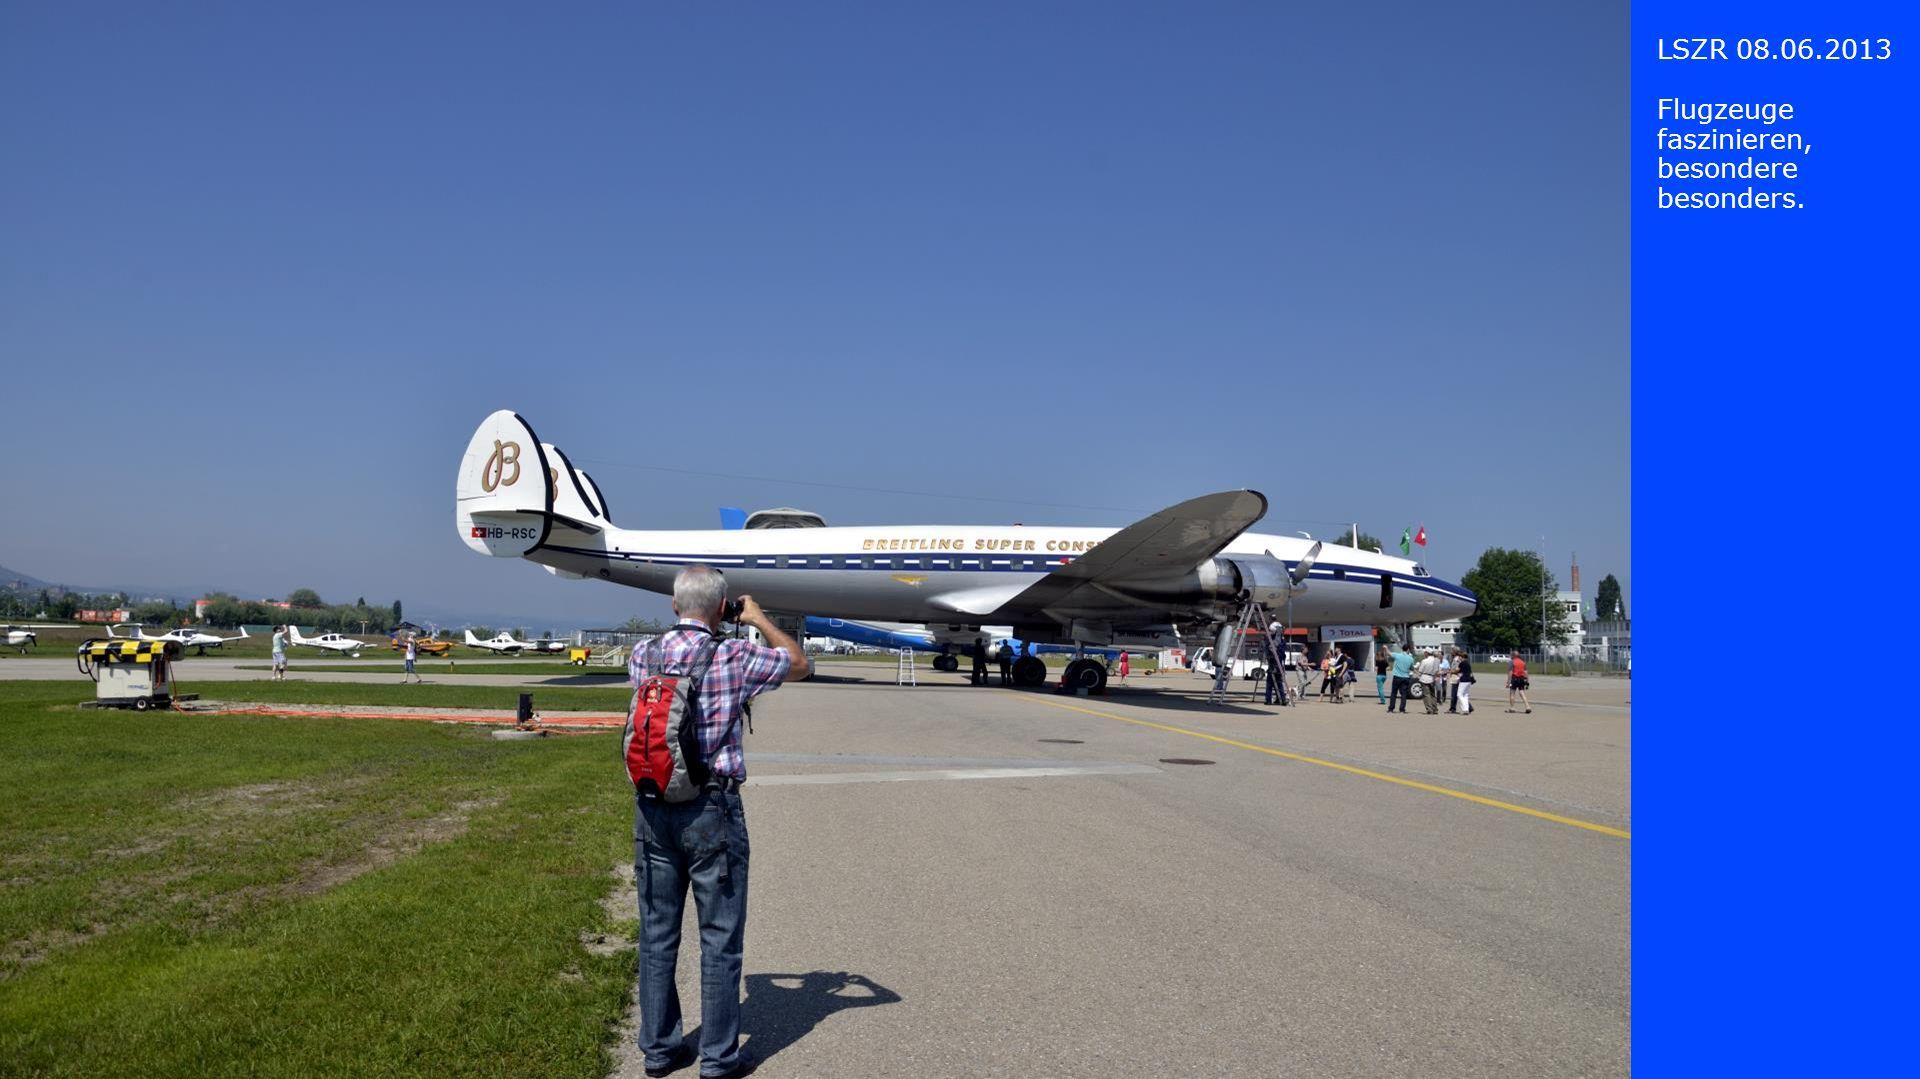 LSZR 08.06.2013 37,4 m Spannweite 34,34 m Länge 31752 kg leer 49900 kg max.